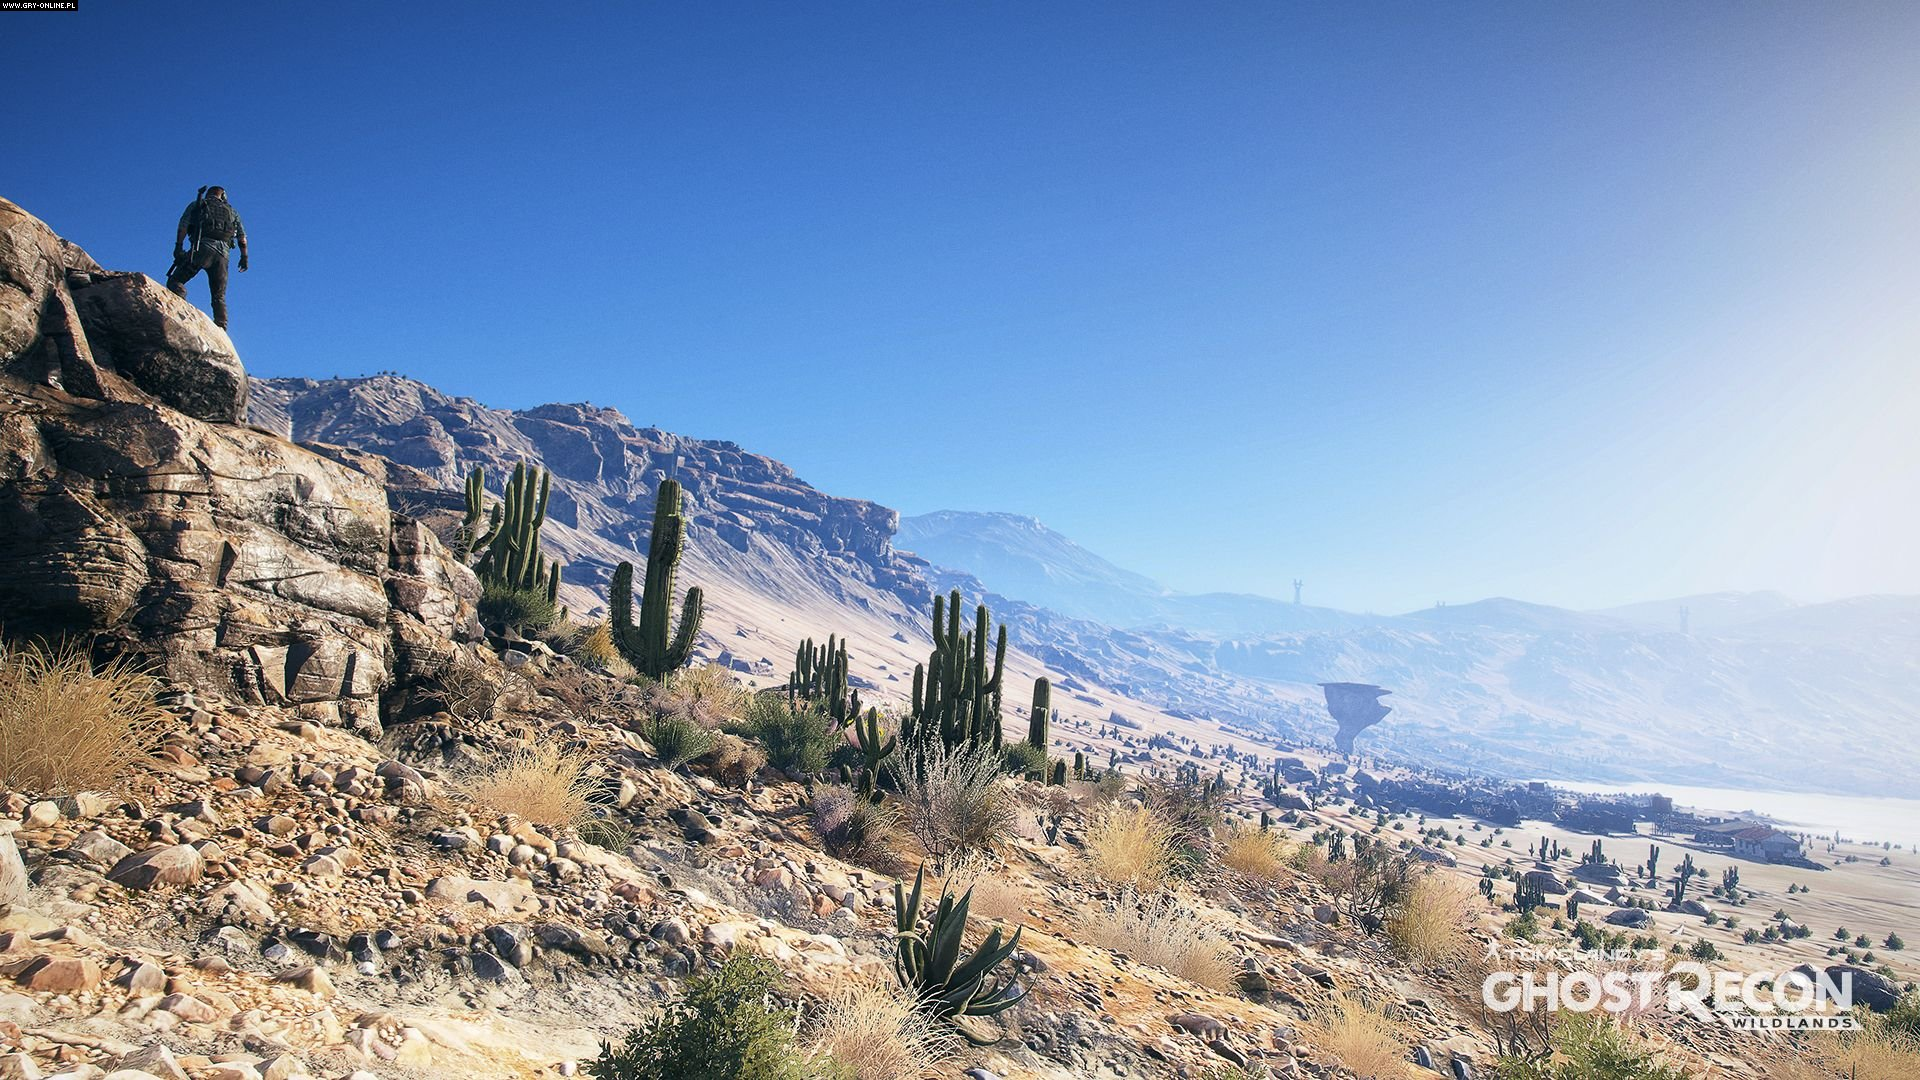 Tom Clancy's Ghost Recon: Wildlands PC, PS4, XONE Games Image 64/64, Ubisoft